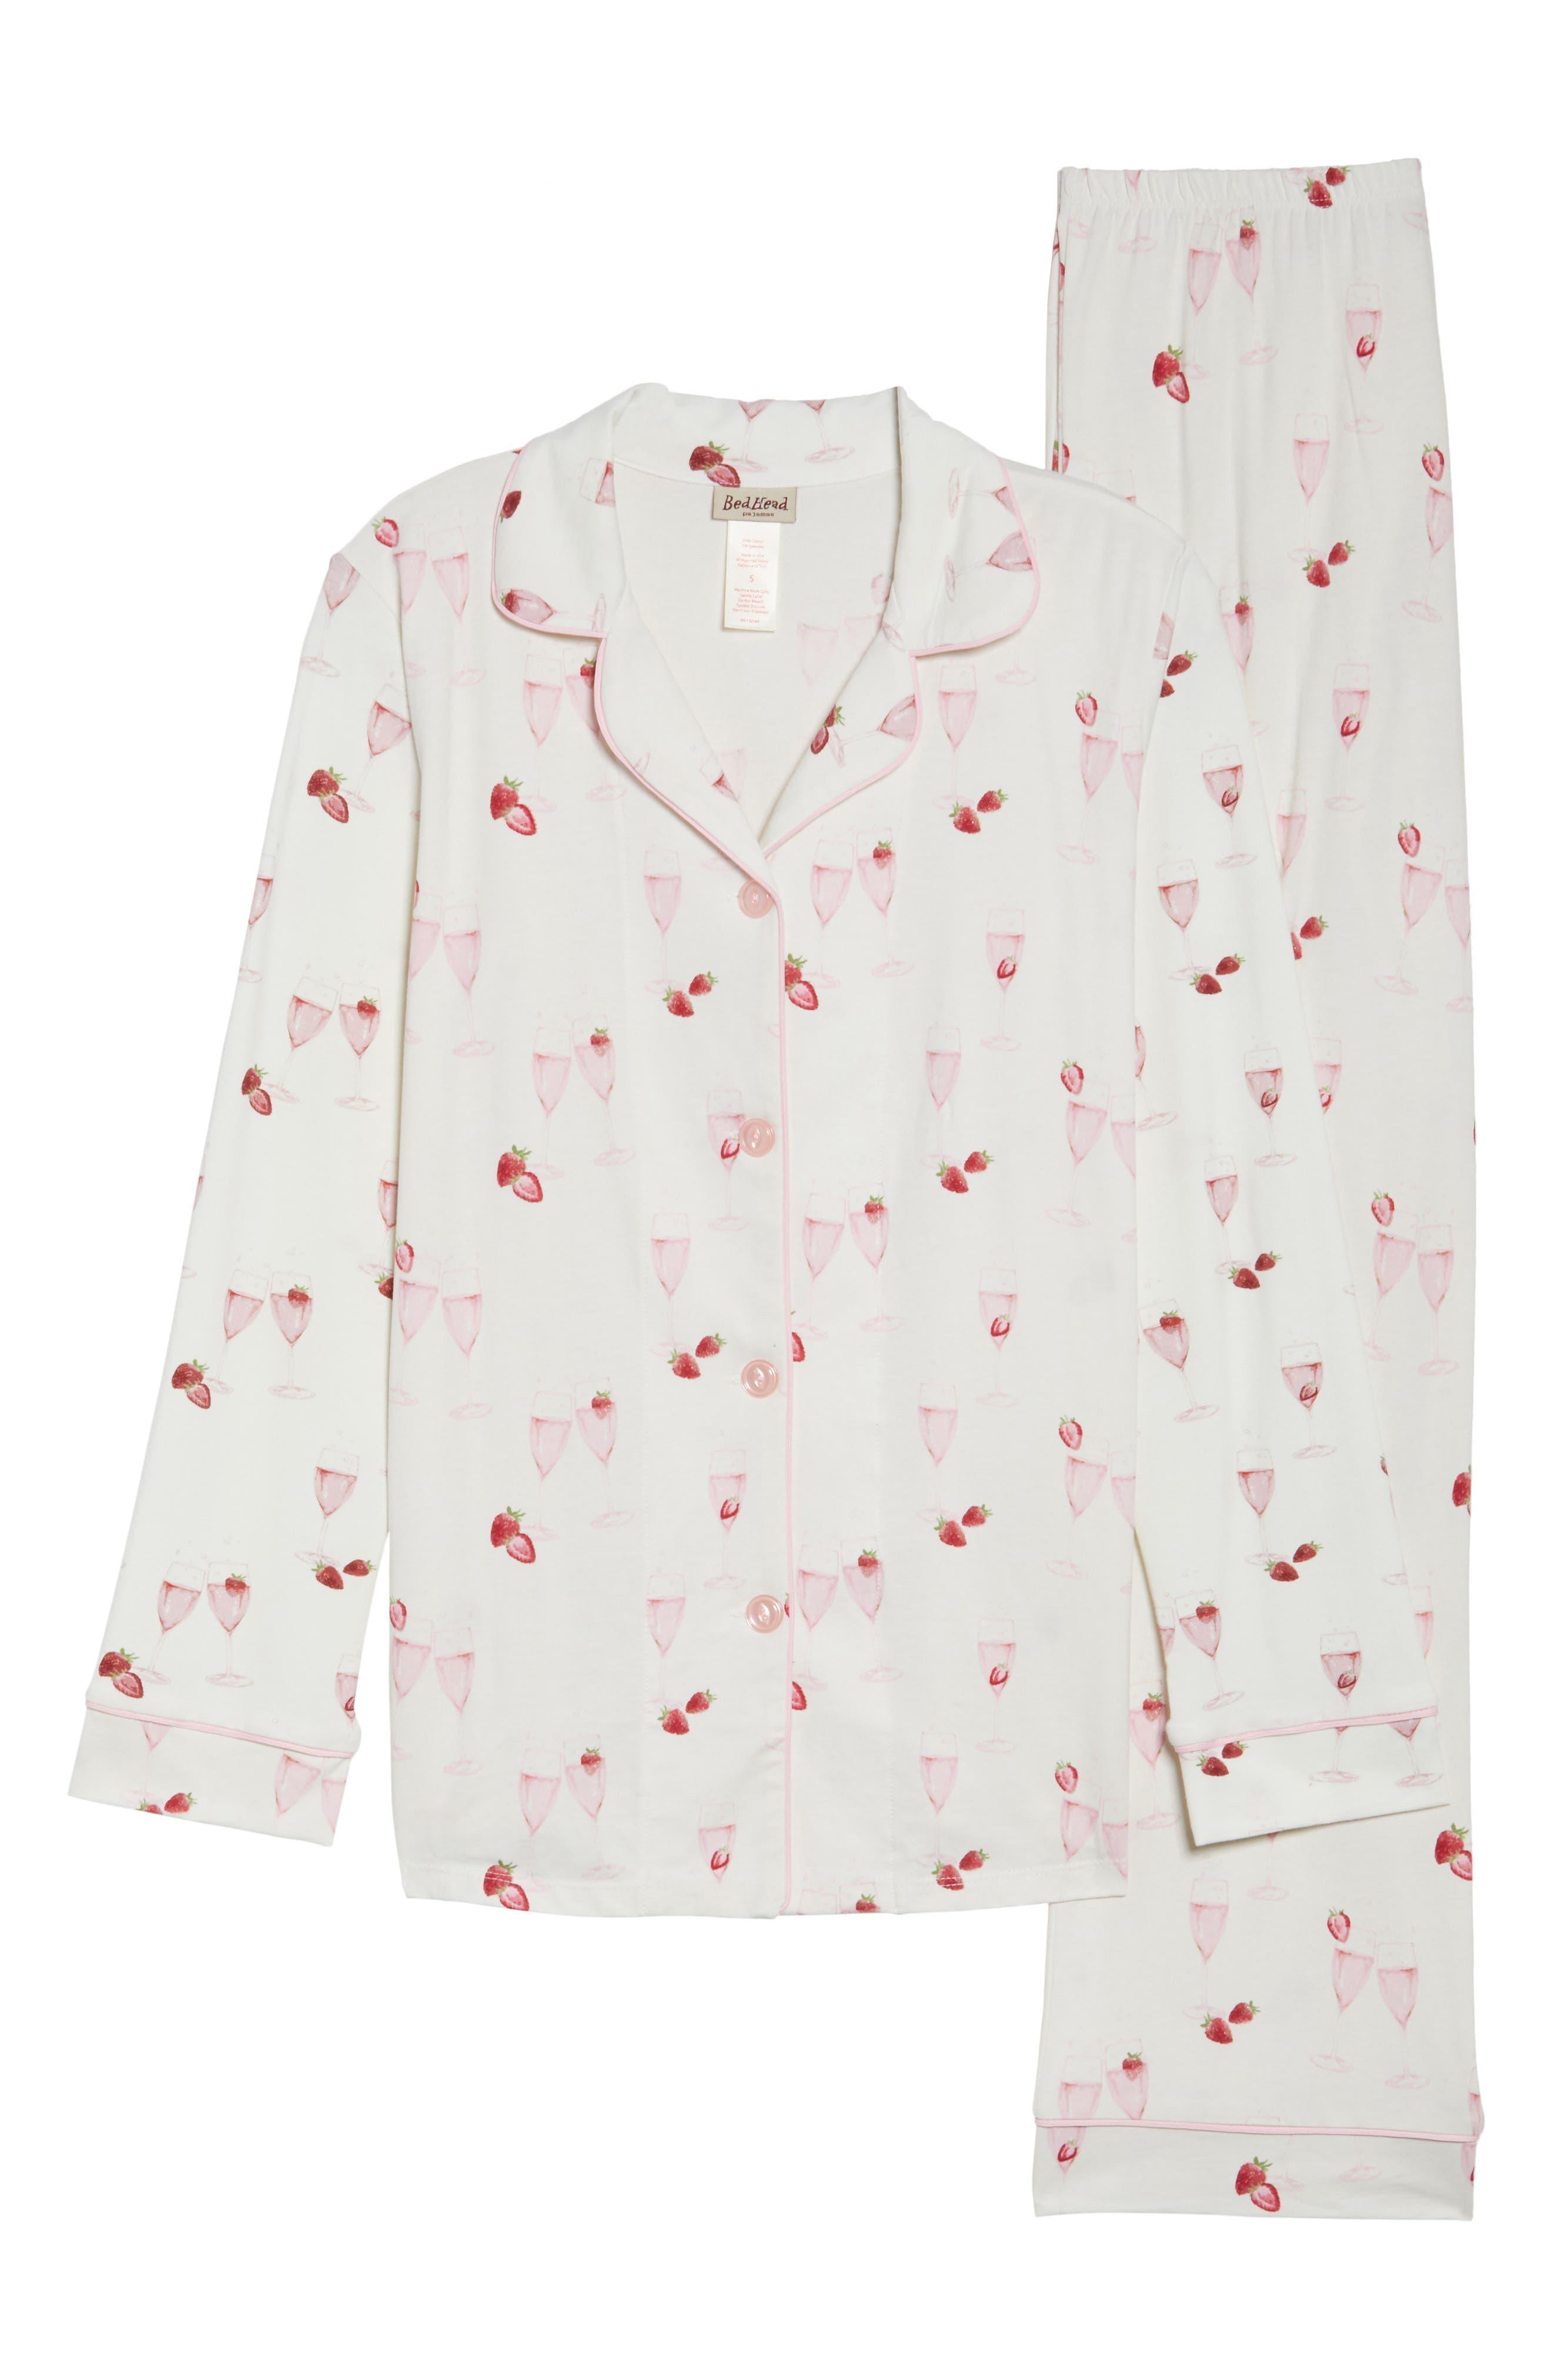 Strawberries & Champagne Print Pajamas,                             Alternate thumbnail 4, color,                             Strawberries And Champagne